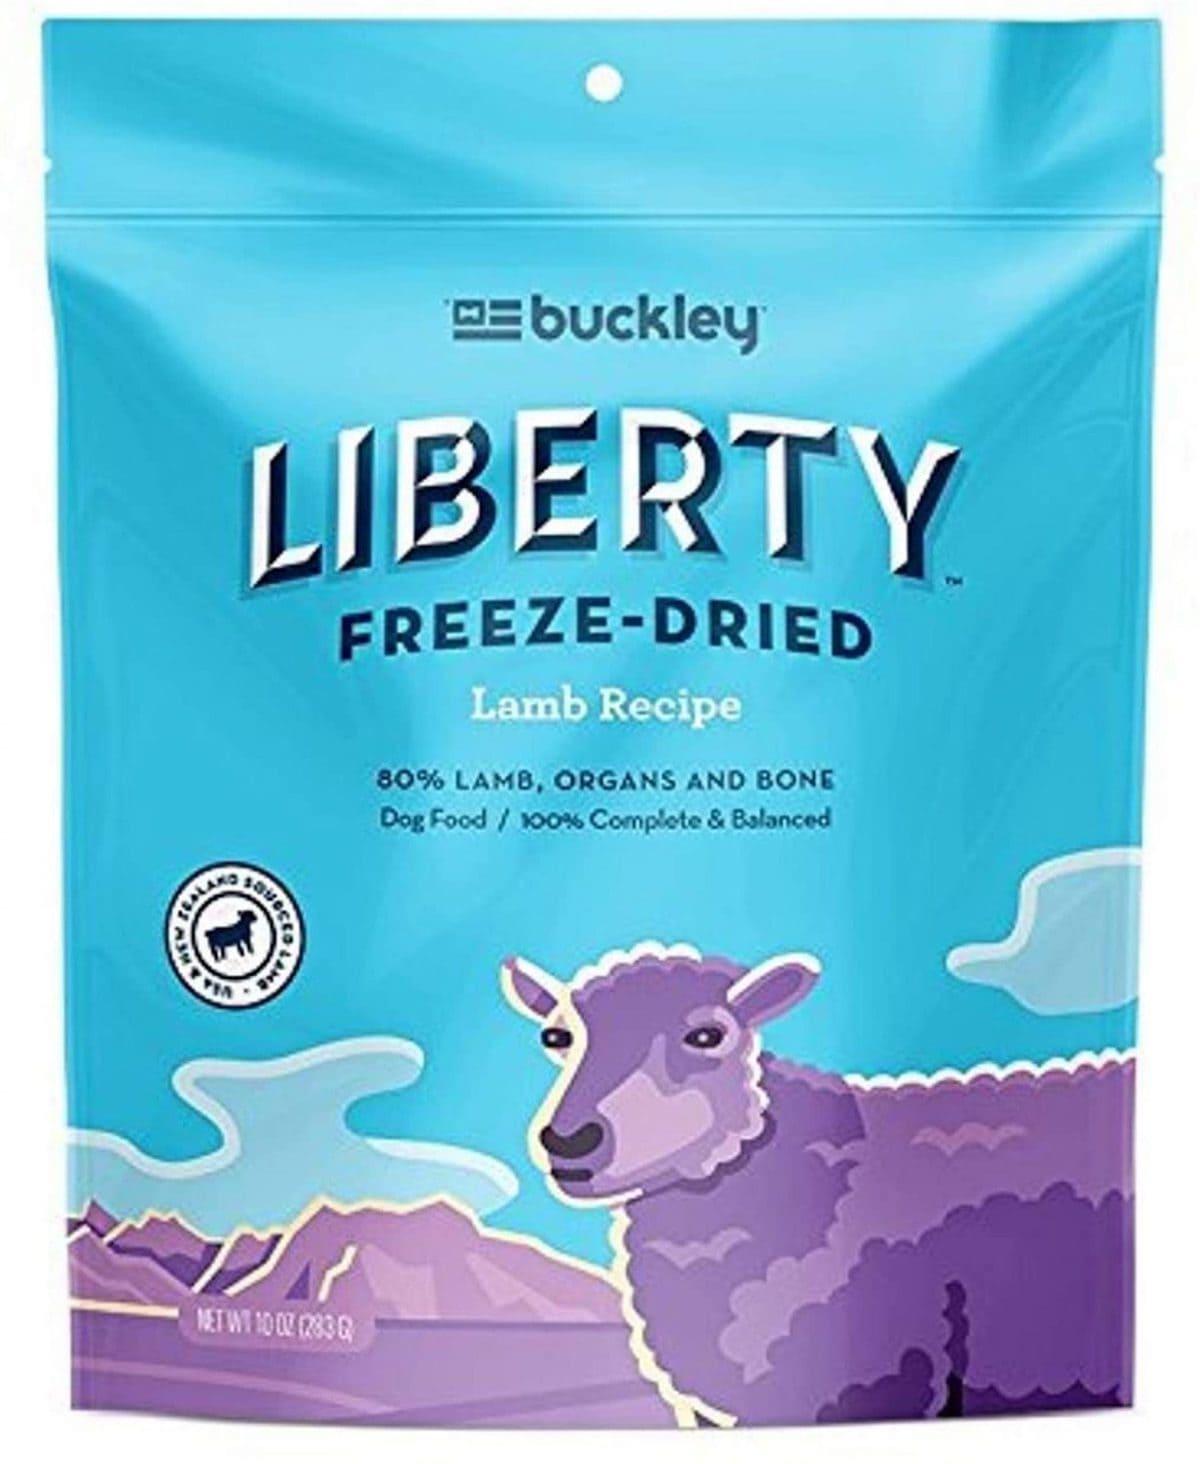 Buckley Liberty Freeze-Dried Dog Food